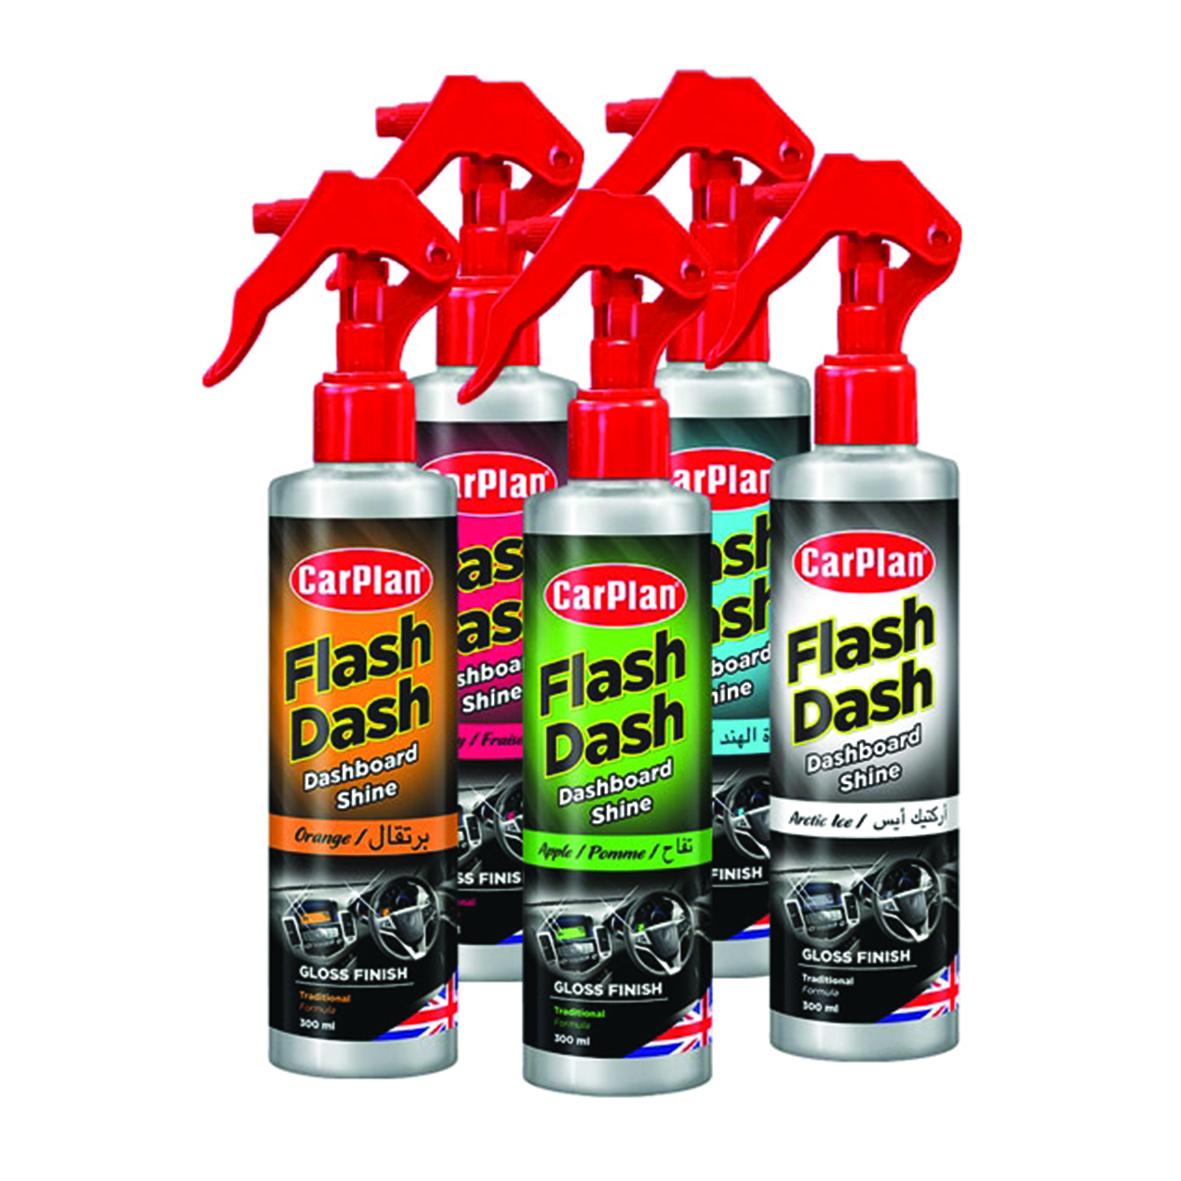 Flash Dash – Pump Spray